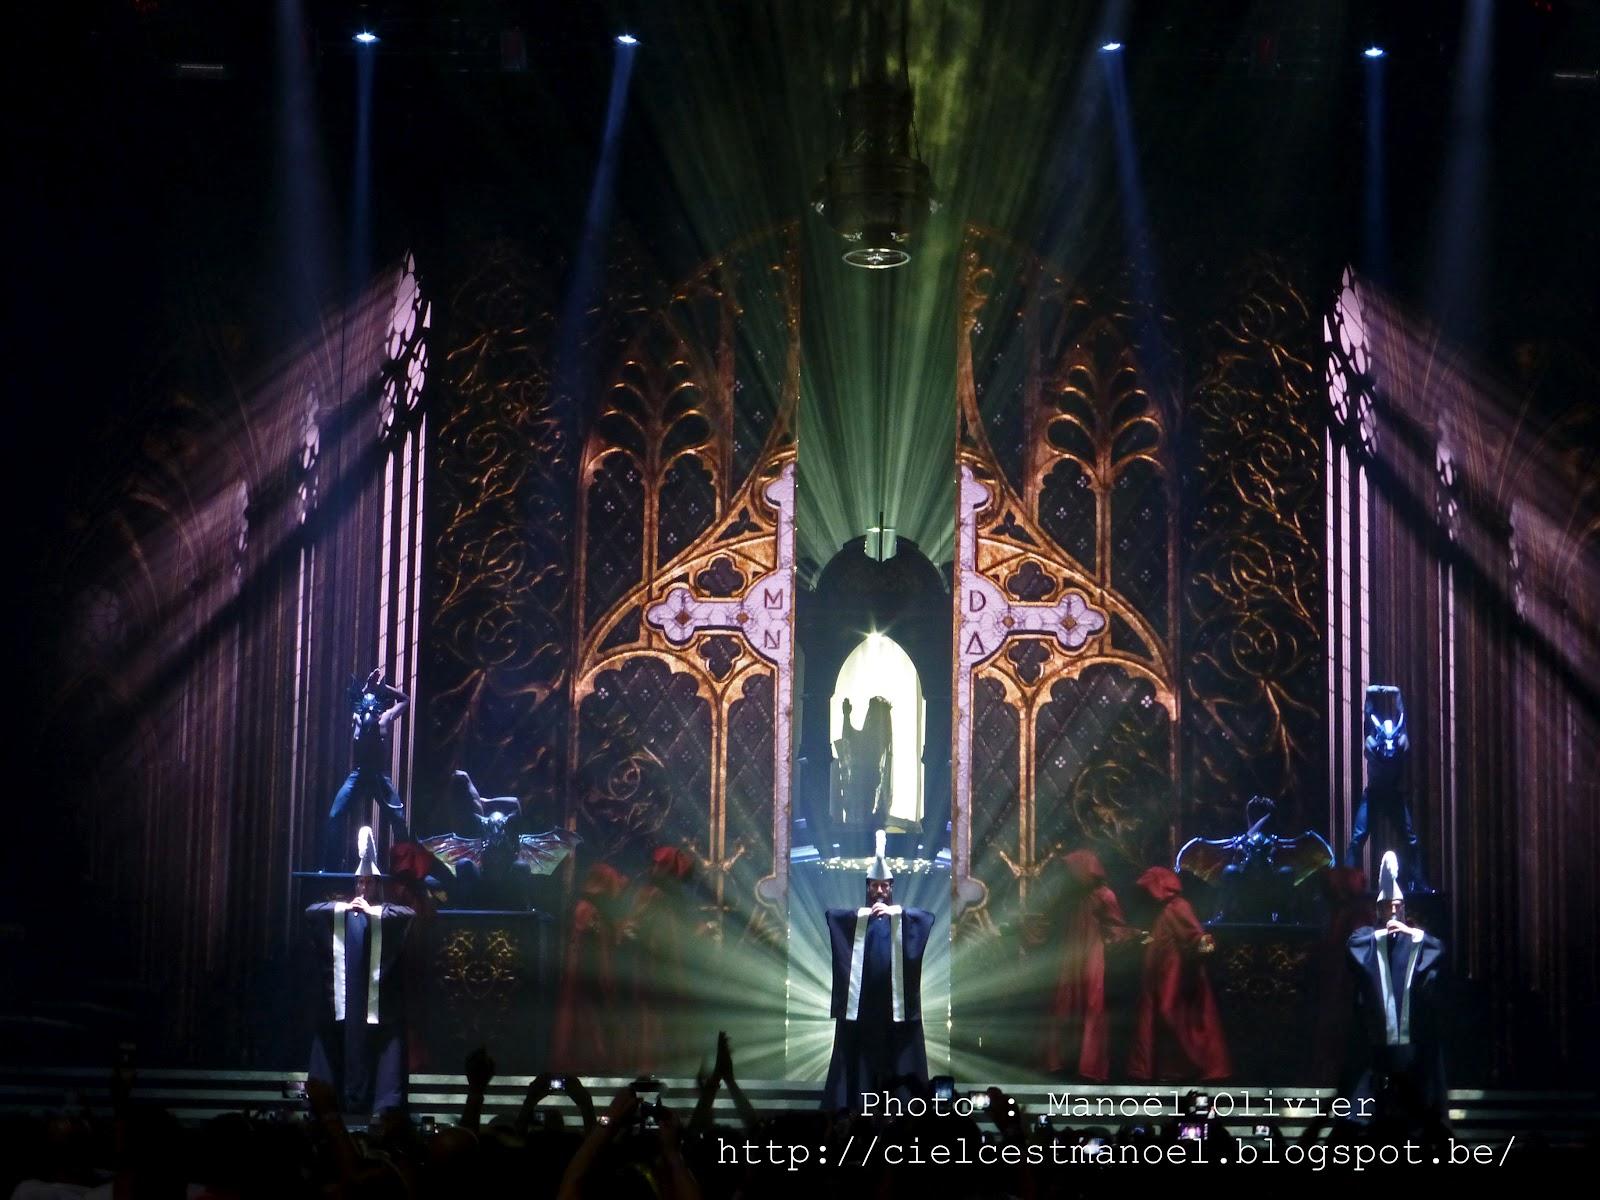 http://4.bp.blogspot.com/-cuqtcBwv5ME/UCZTQ0RCtpI/AAAAAAAAEjs/KpXHL6Jn9gE/s1600/013+-+Madonna+-+The+MDNA+Tour+2012+-+Lanxess+Arena+(Cologne)+-++10.07.2012+-+Intro.JPG